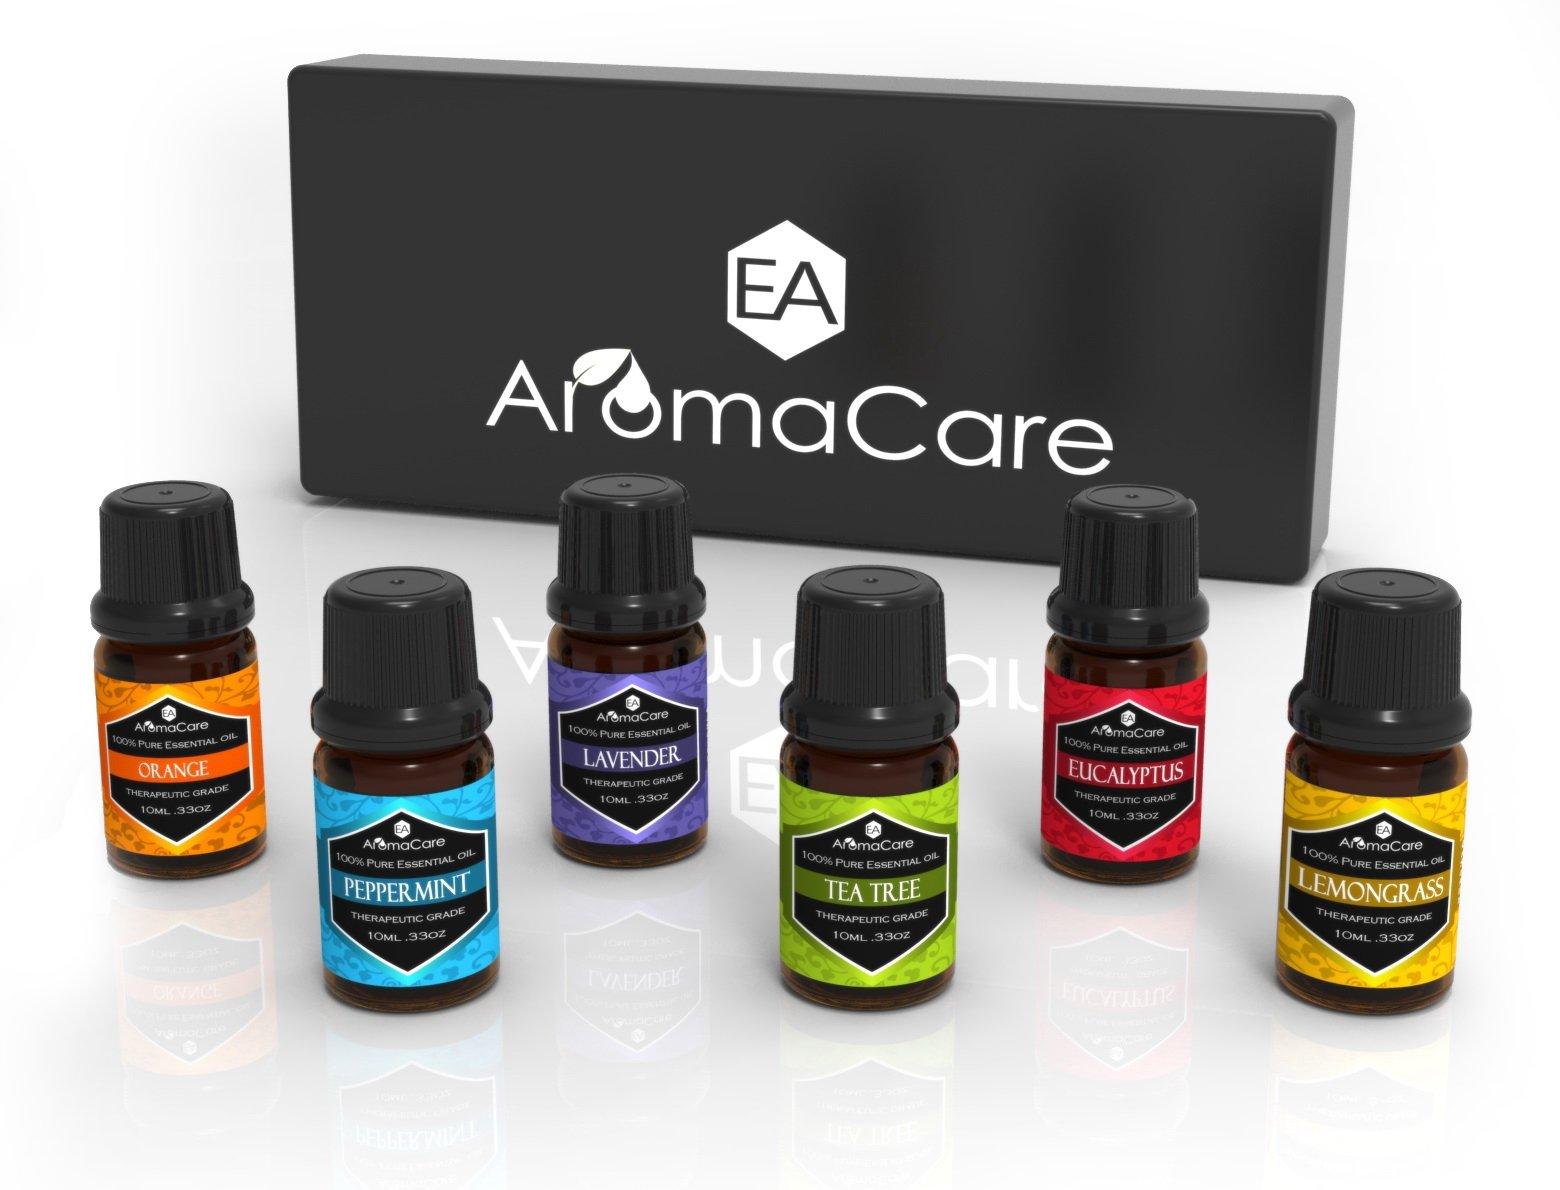 EA Aromacare Aromatherapy Essential Oils Gift Set,Therapeutic Grade, 100% Pure (Lavender,Peppermint,Lemongrass,Tea Tree,Eucalyptus,Orange & e-book) Massage Essential Oils, (Black)